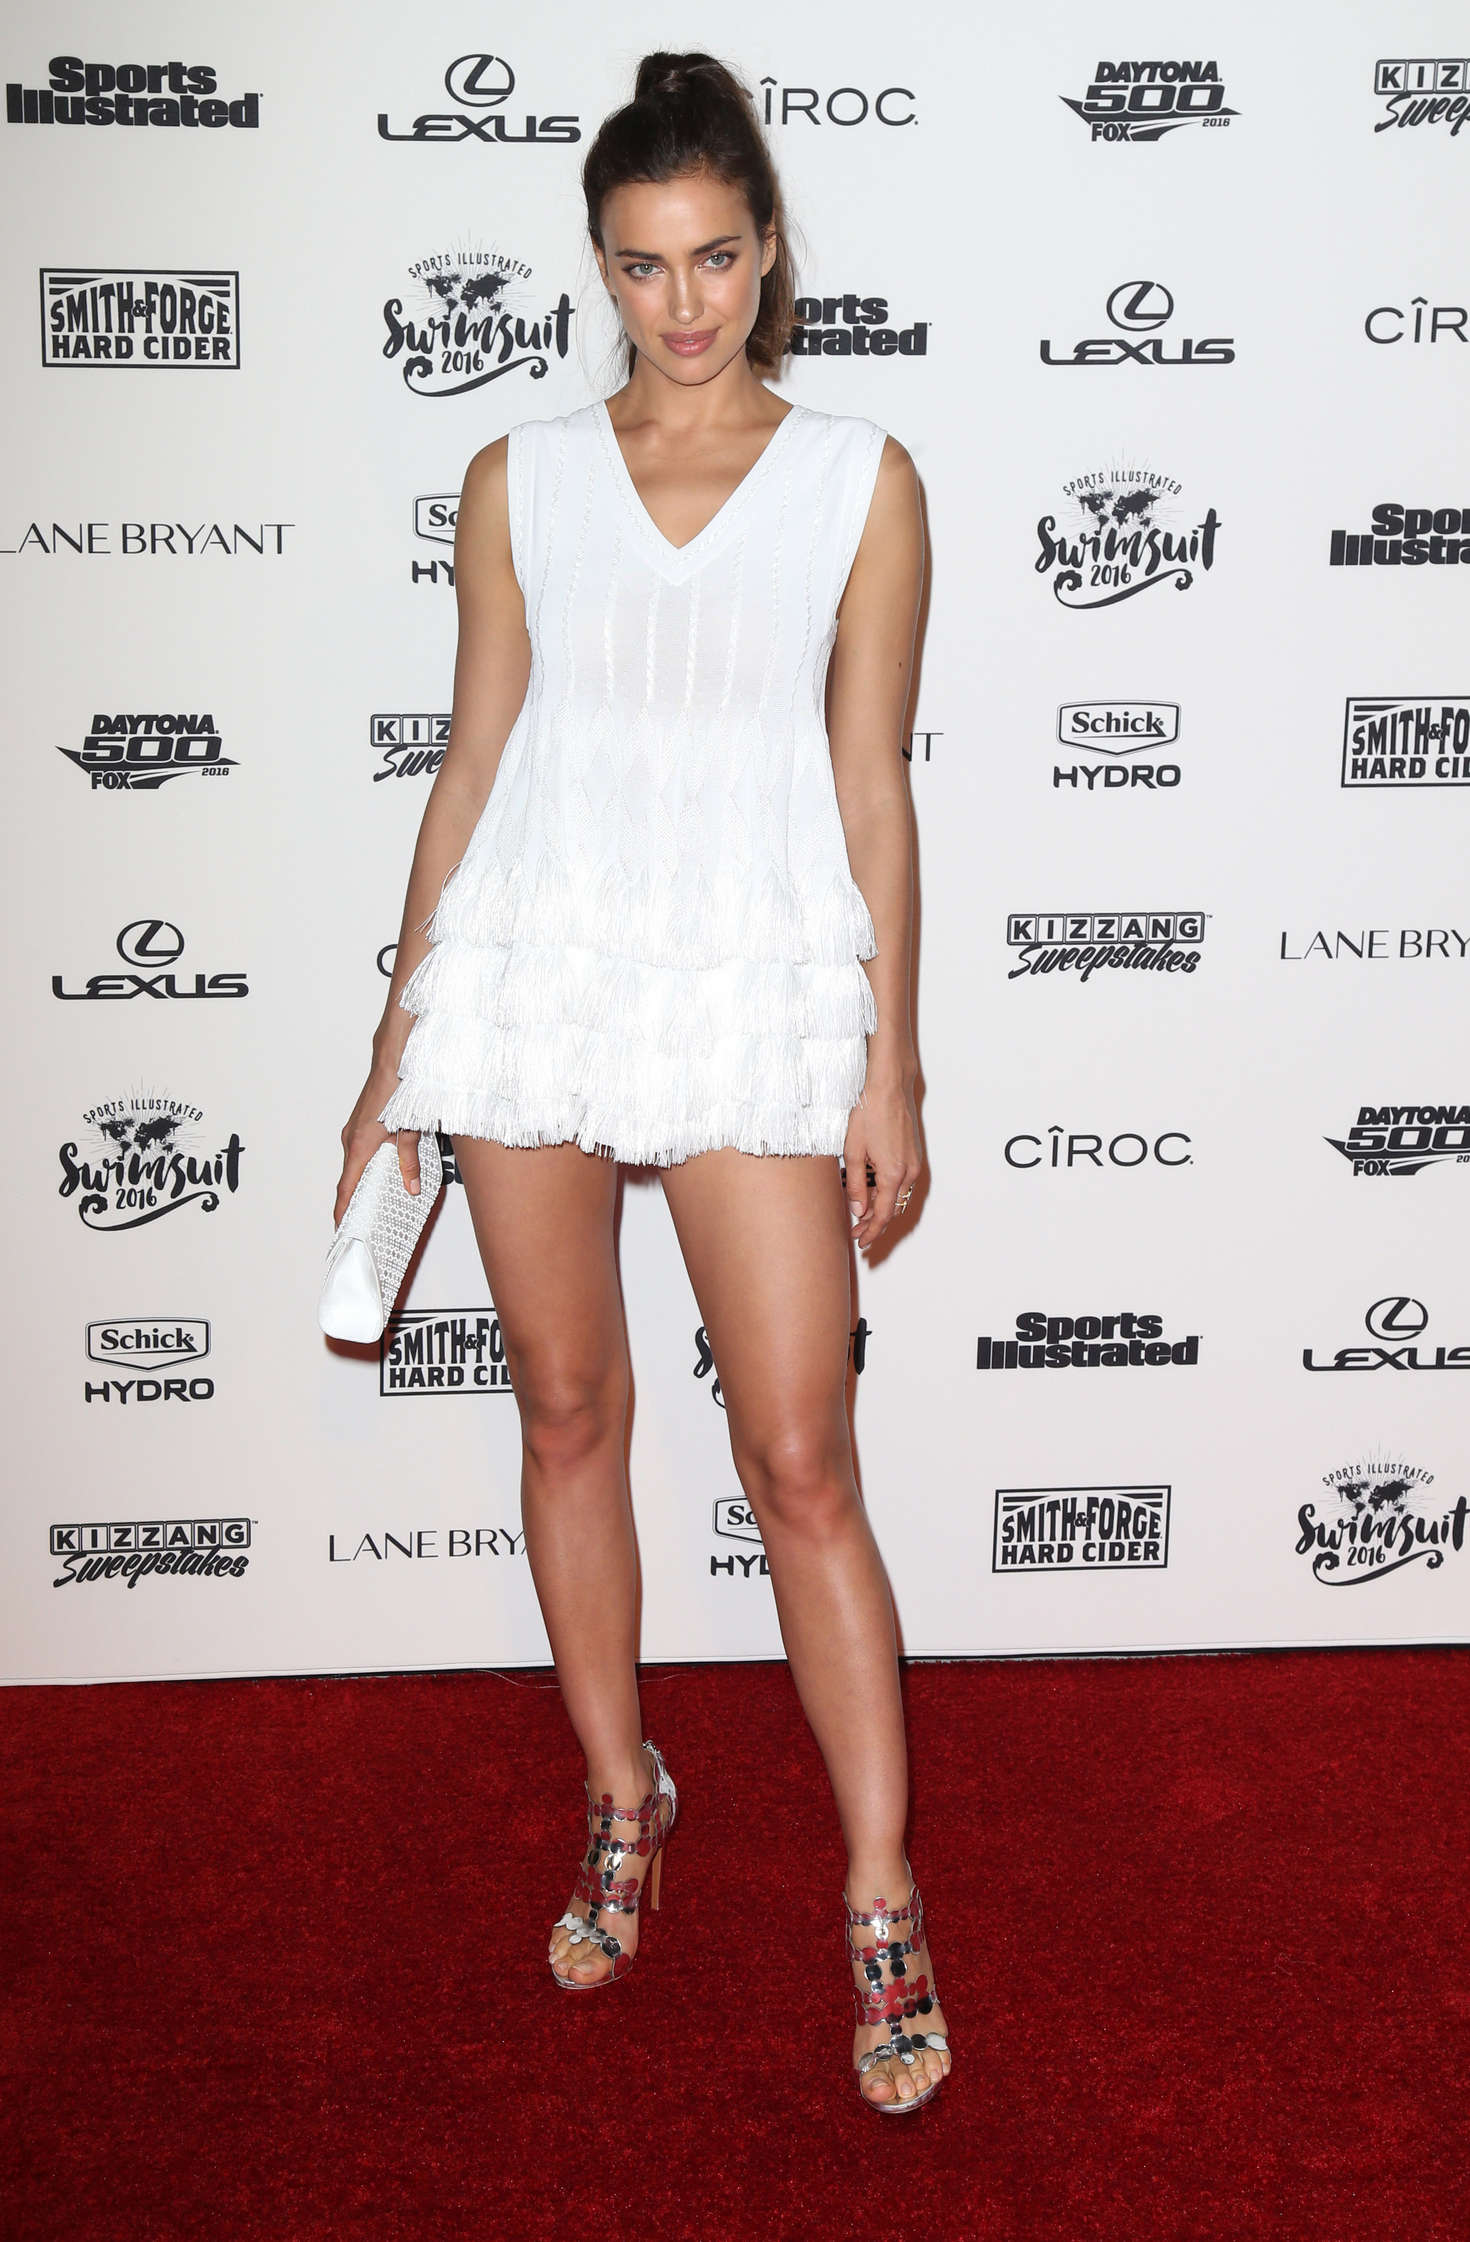 ¿Cuánto mide Irina Shayk? - Altura - Real height Irina-Shayk:-Sports-Illustrated-Celebrates-Swimsuit-2016-VIP-Red-Carpet-Event--01